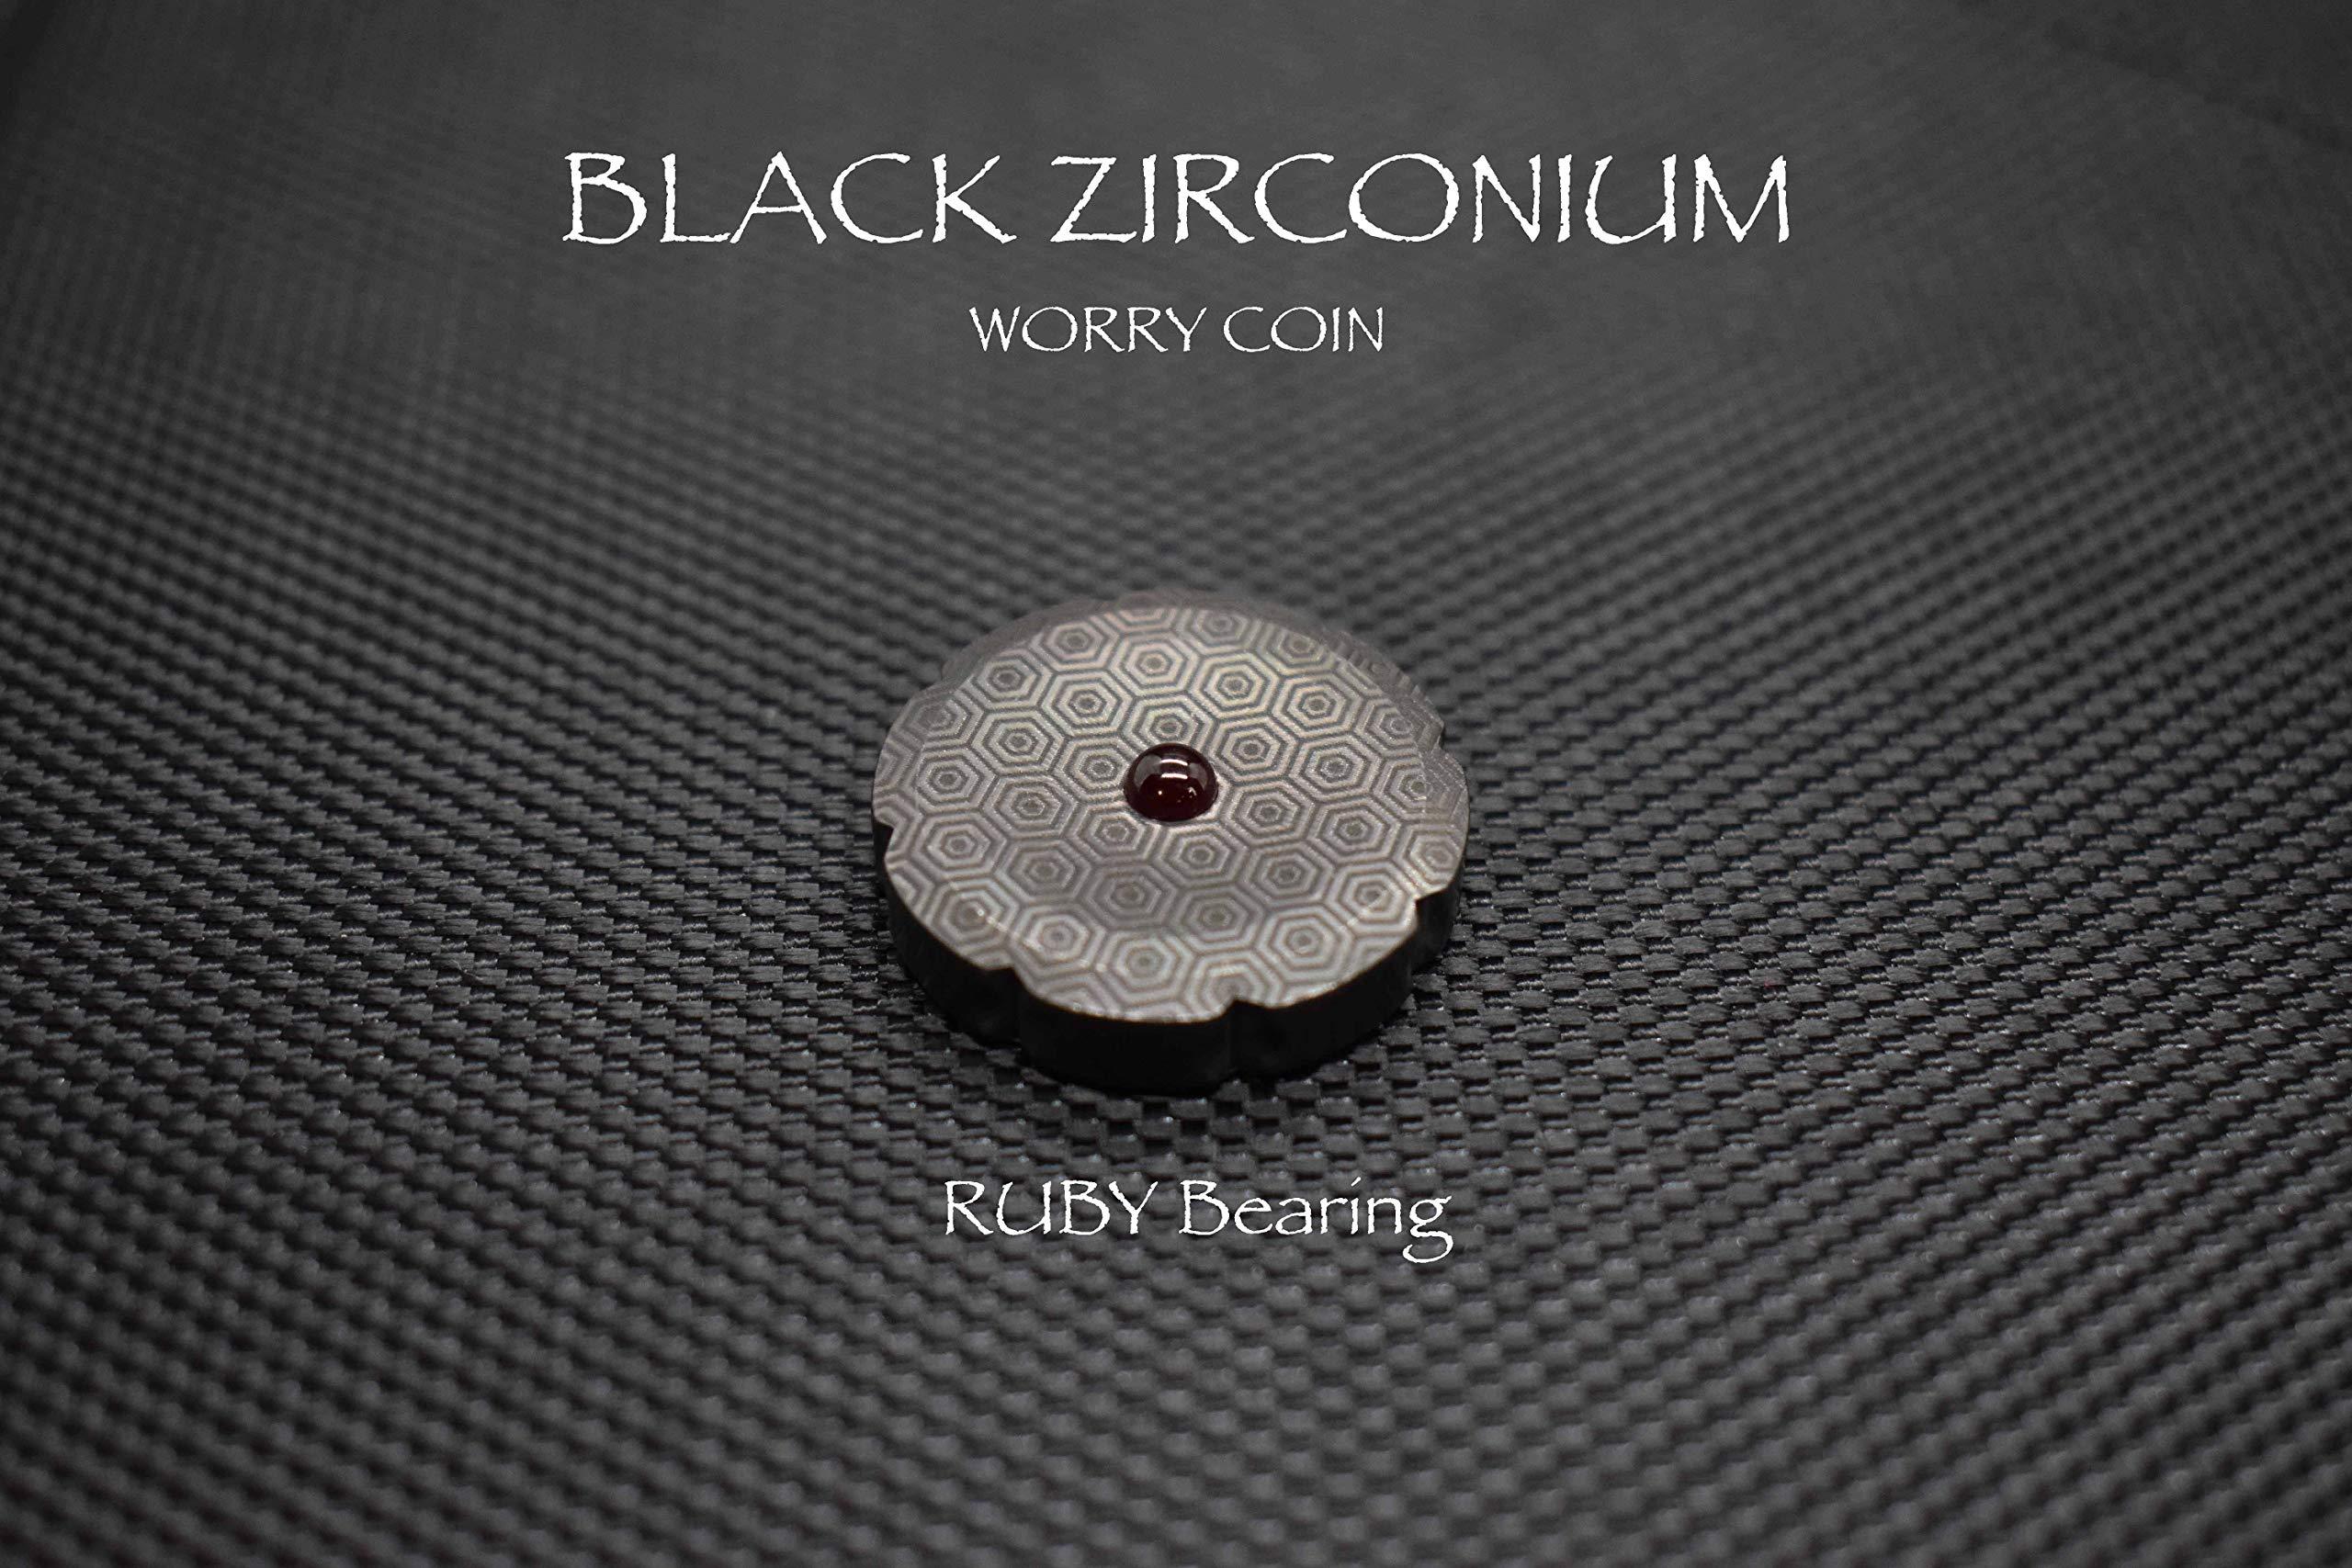 MetonBoss Worry Coin Black Zirconium & Ruby Bearing | Everyday Carry Gear | Precision-Made and Desktop Display